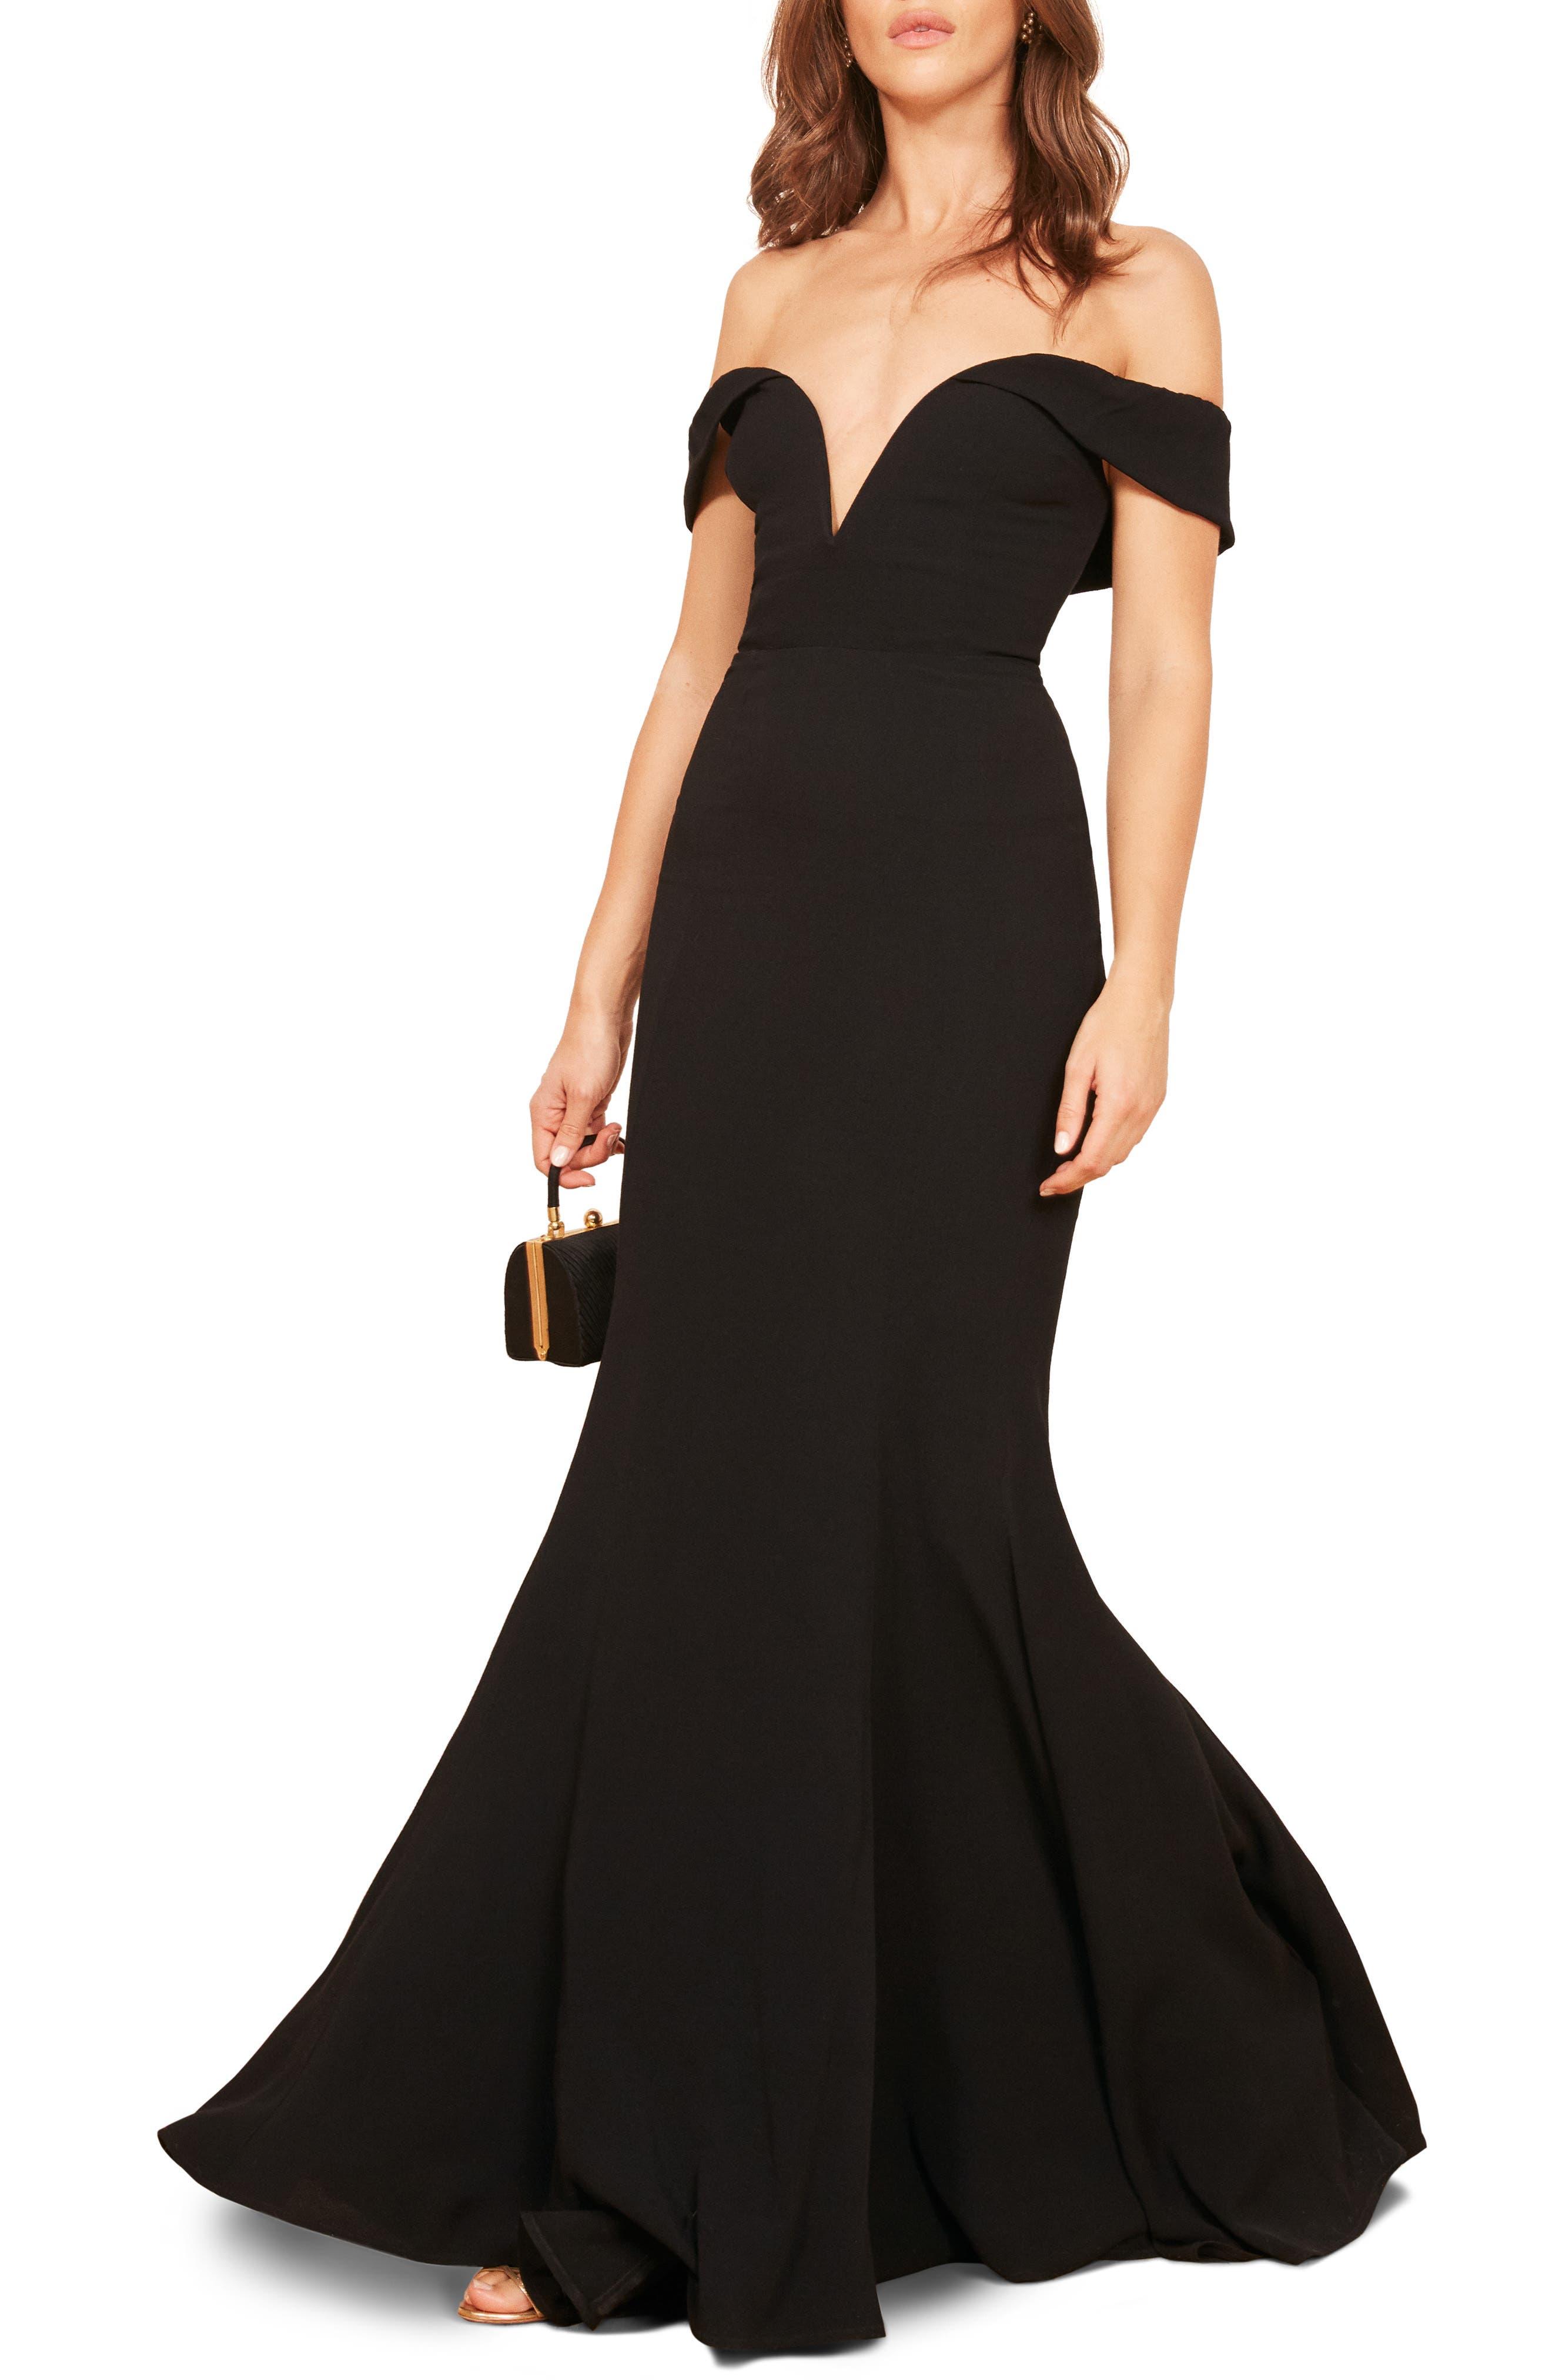 Bali Gown,                             Main thumbnail 1, color,                             BLACK